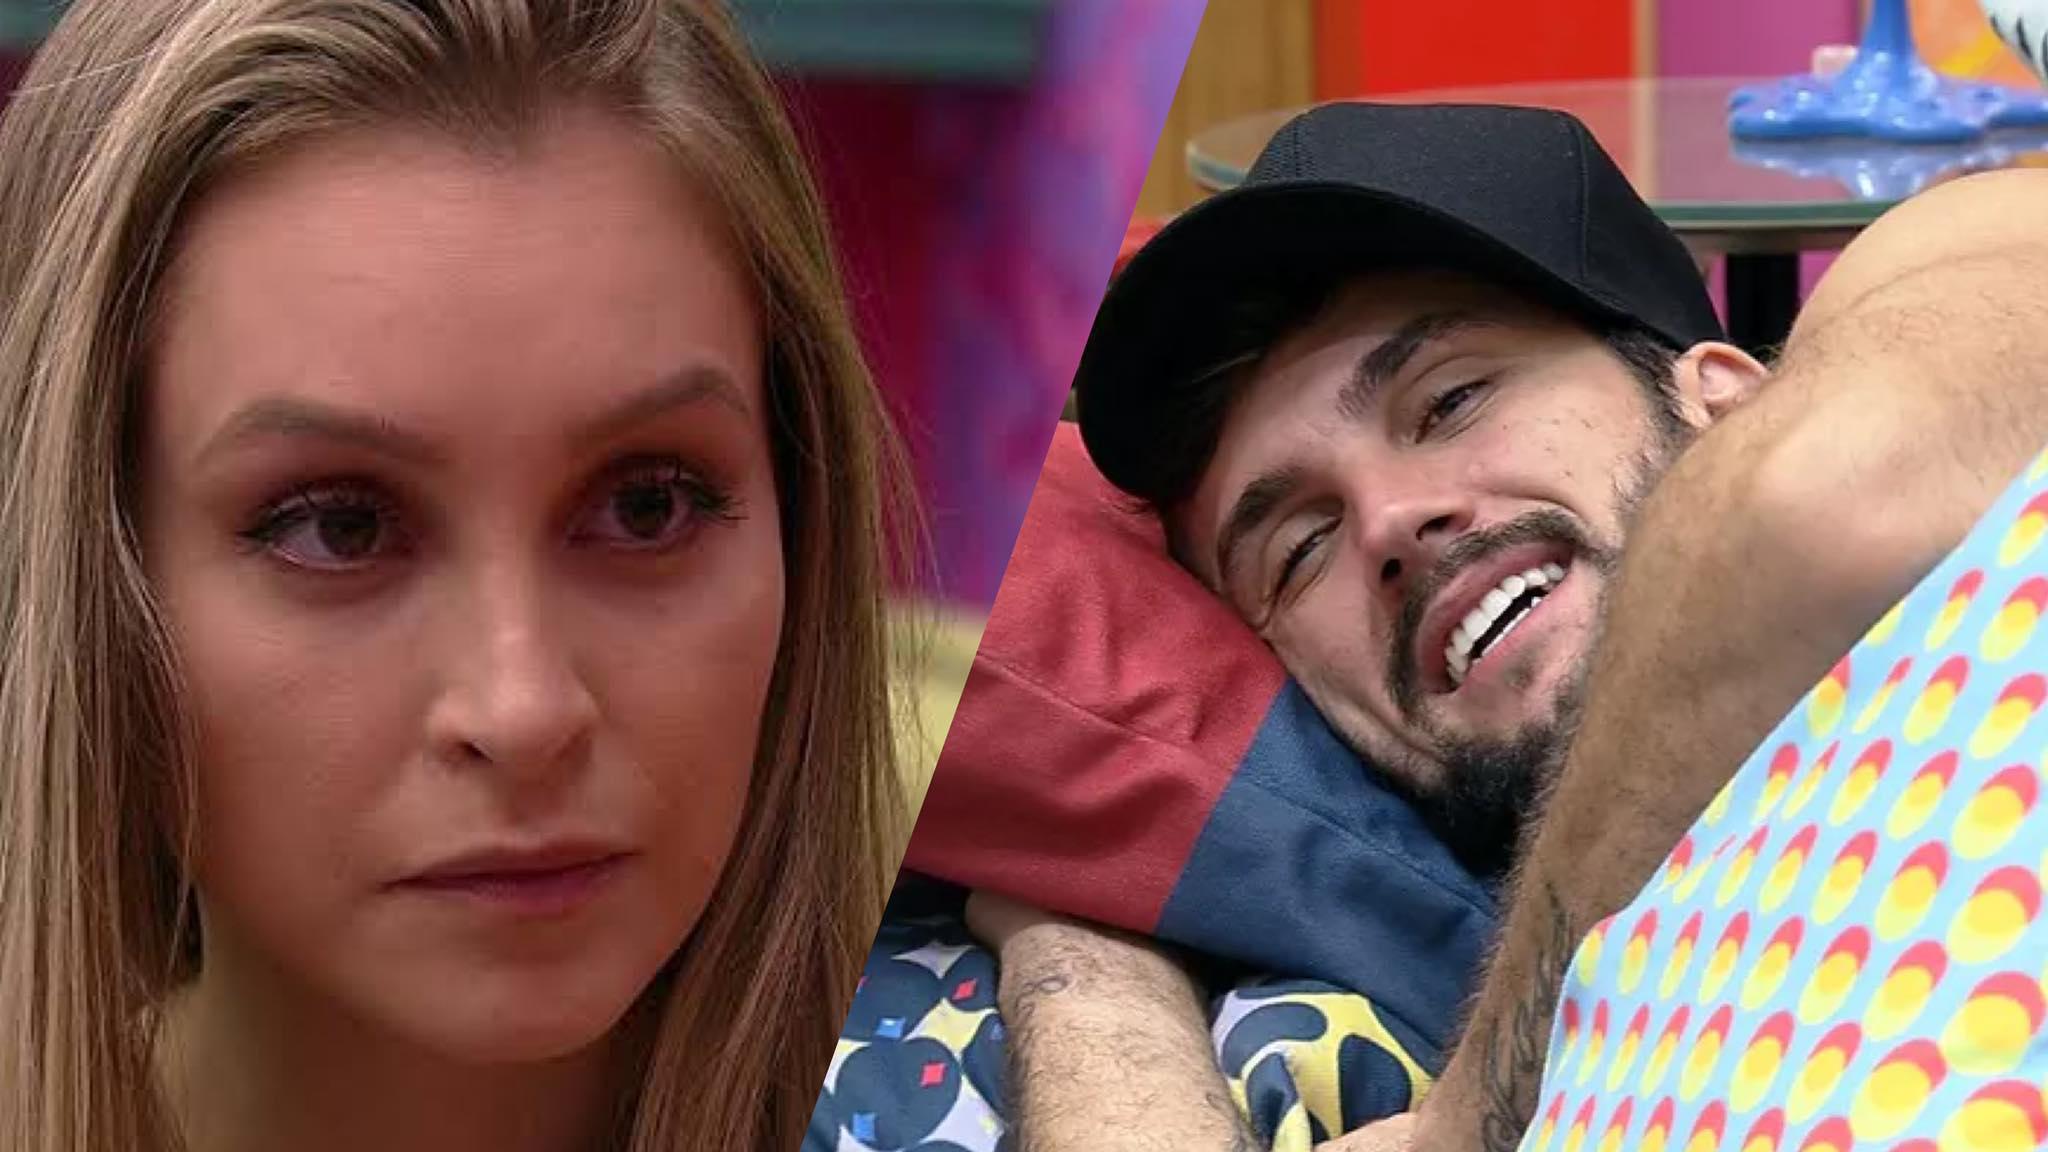 Arthur revelou que antes de Carla Diaz se interessou por outra sister no BBB 21 (montagem/ Fashion Bubbles)